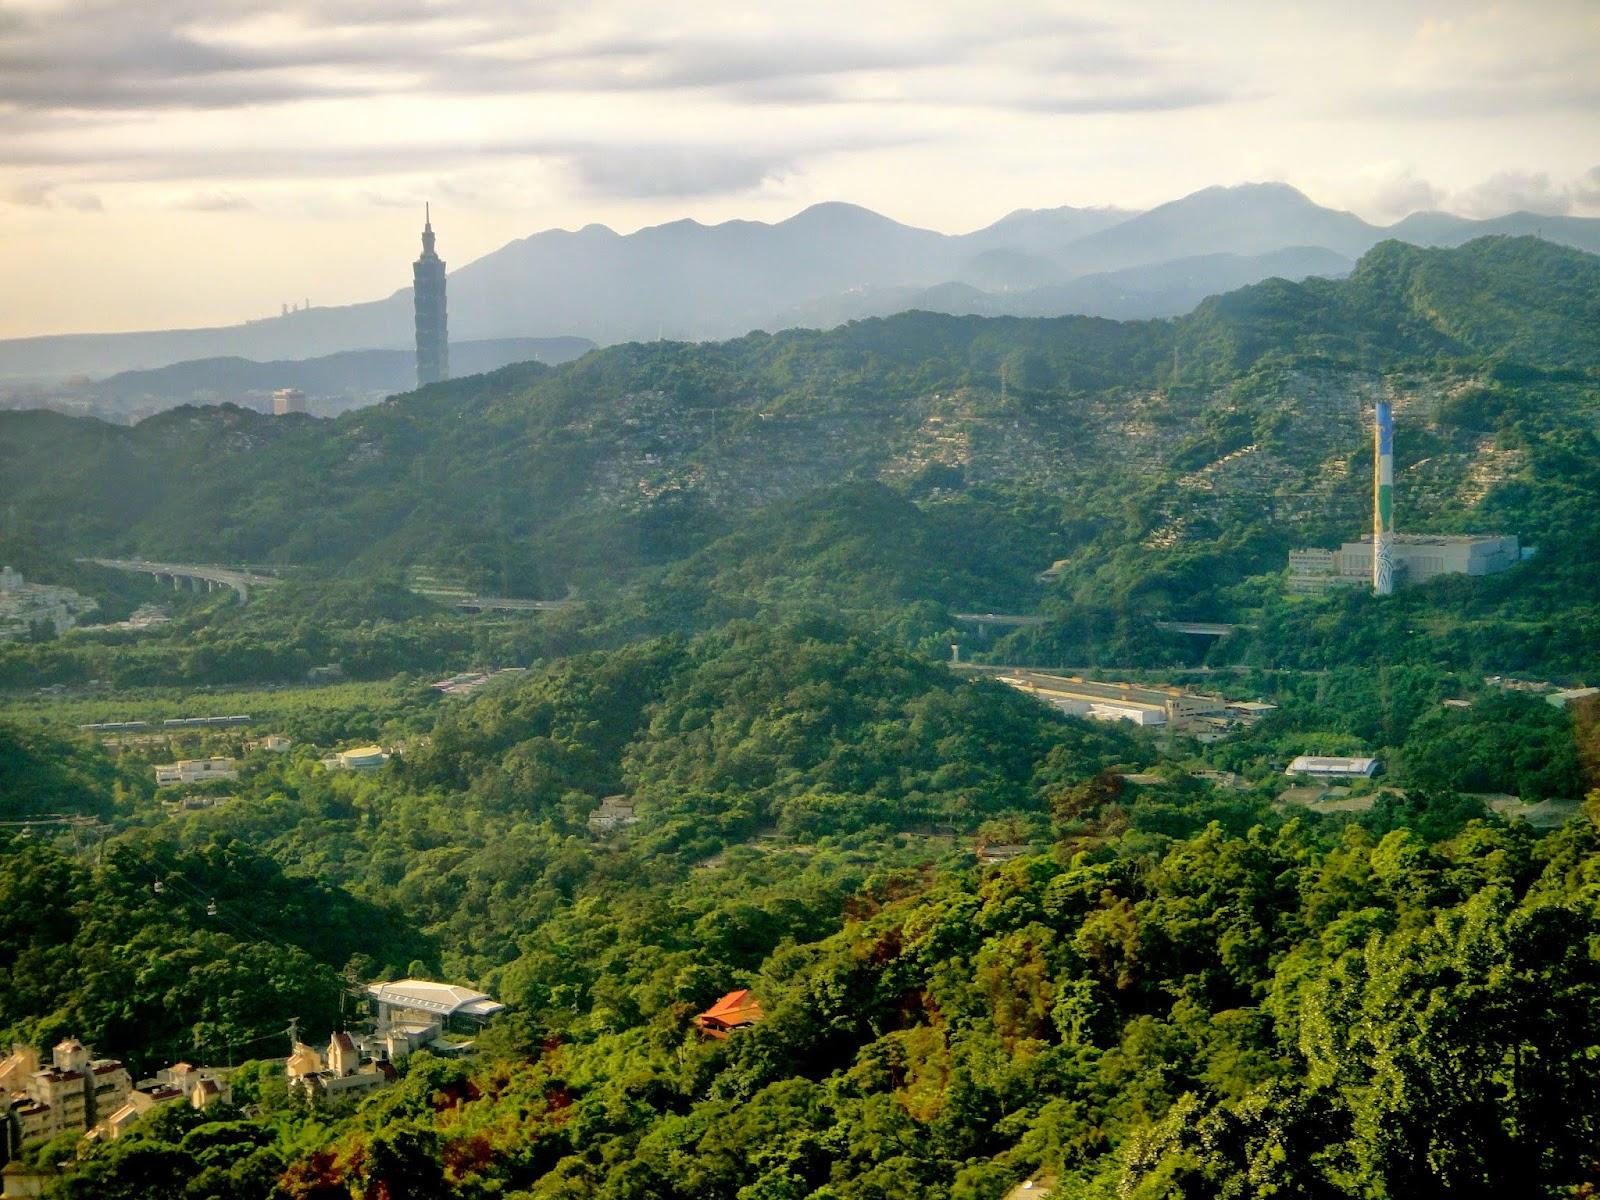 View from Maokong Gondola Taipei Taiwan